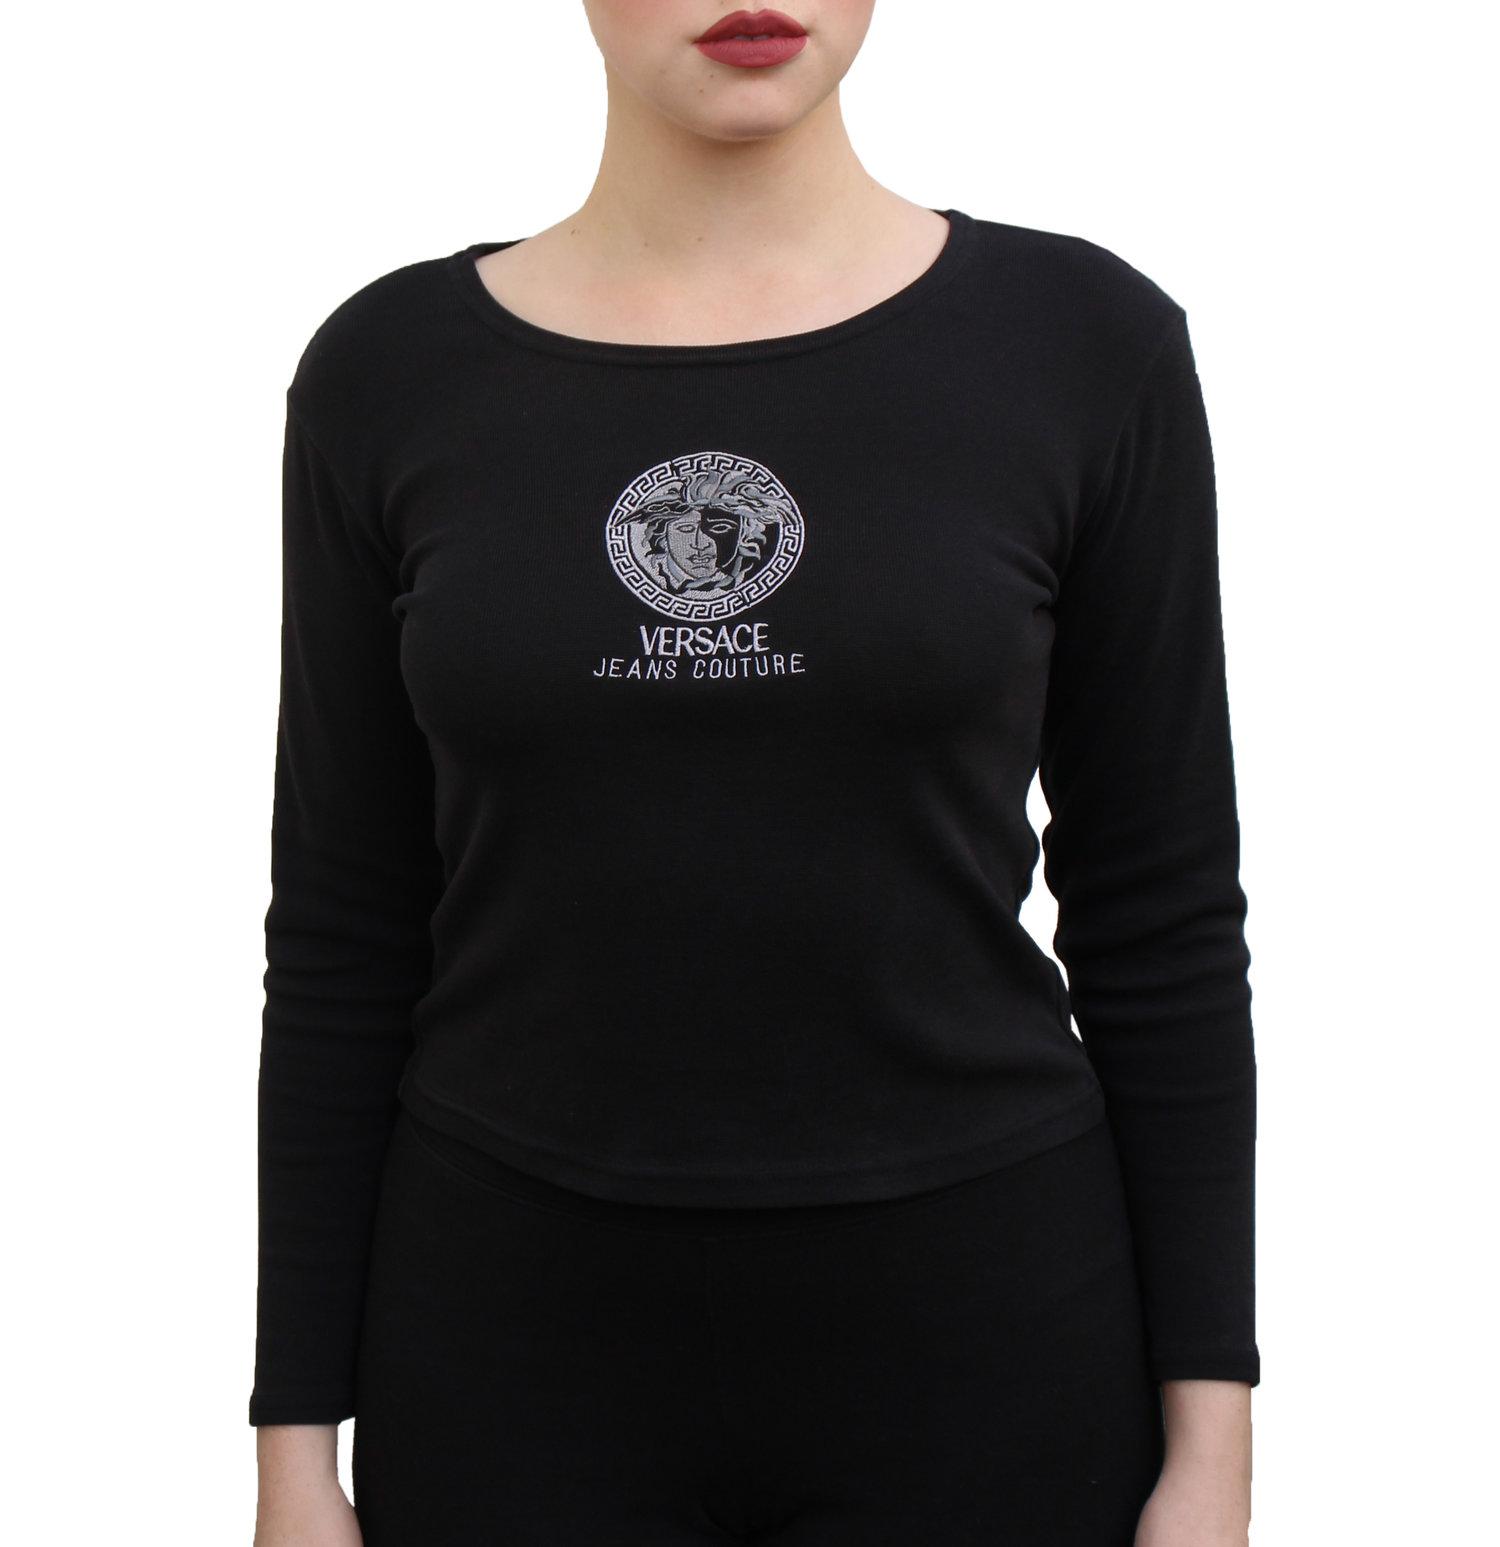 37ee14c037 Versace Jeans Couture Shirt Vintage | Saddha